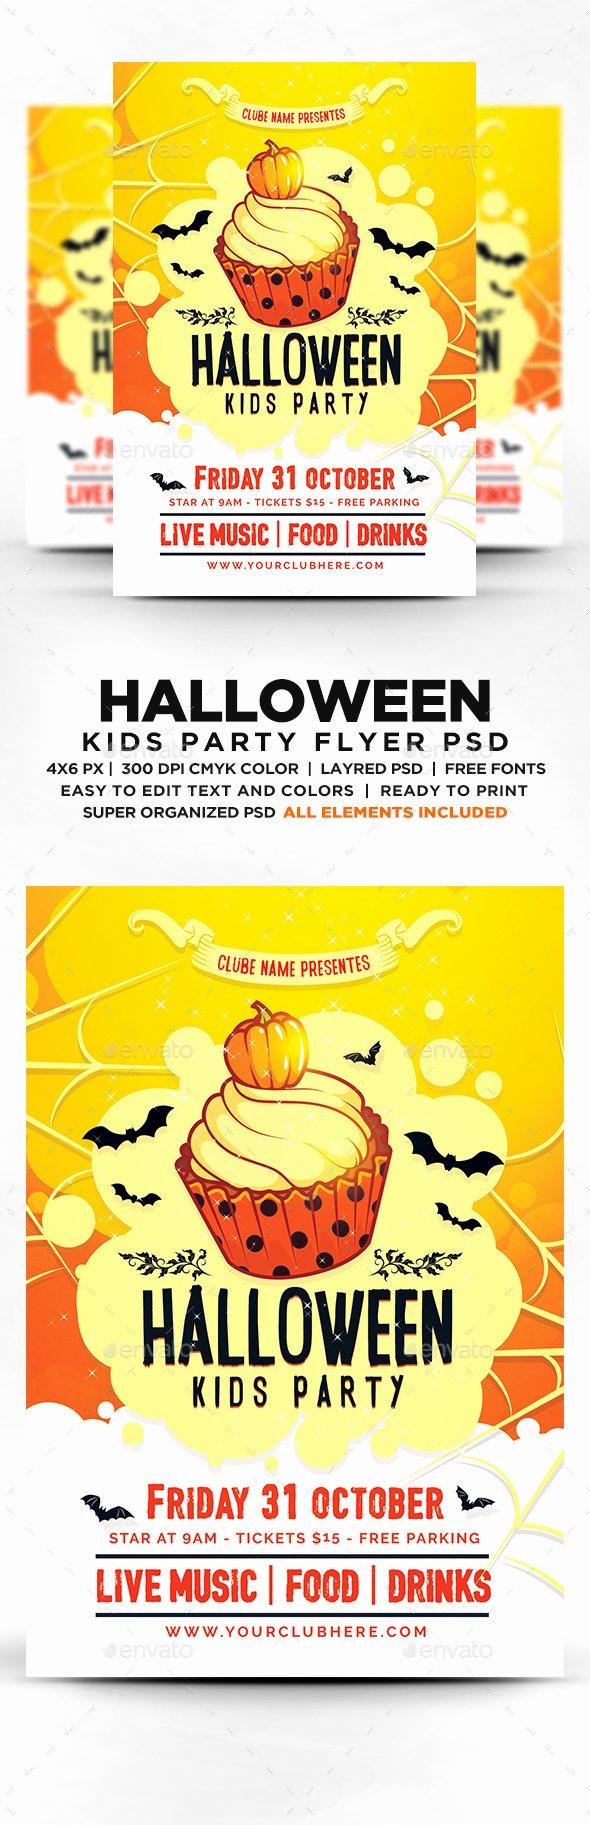 Halloween Kids Party Flyer Psd